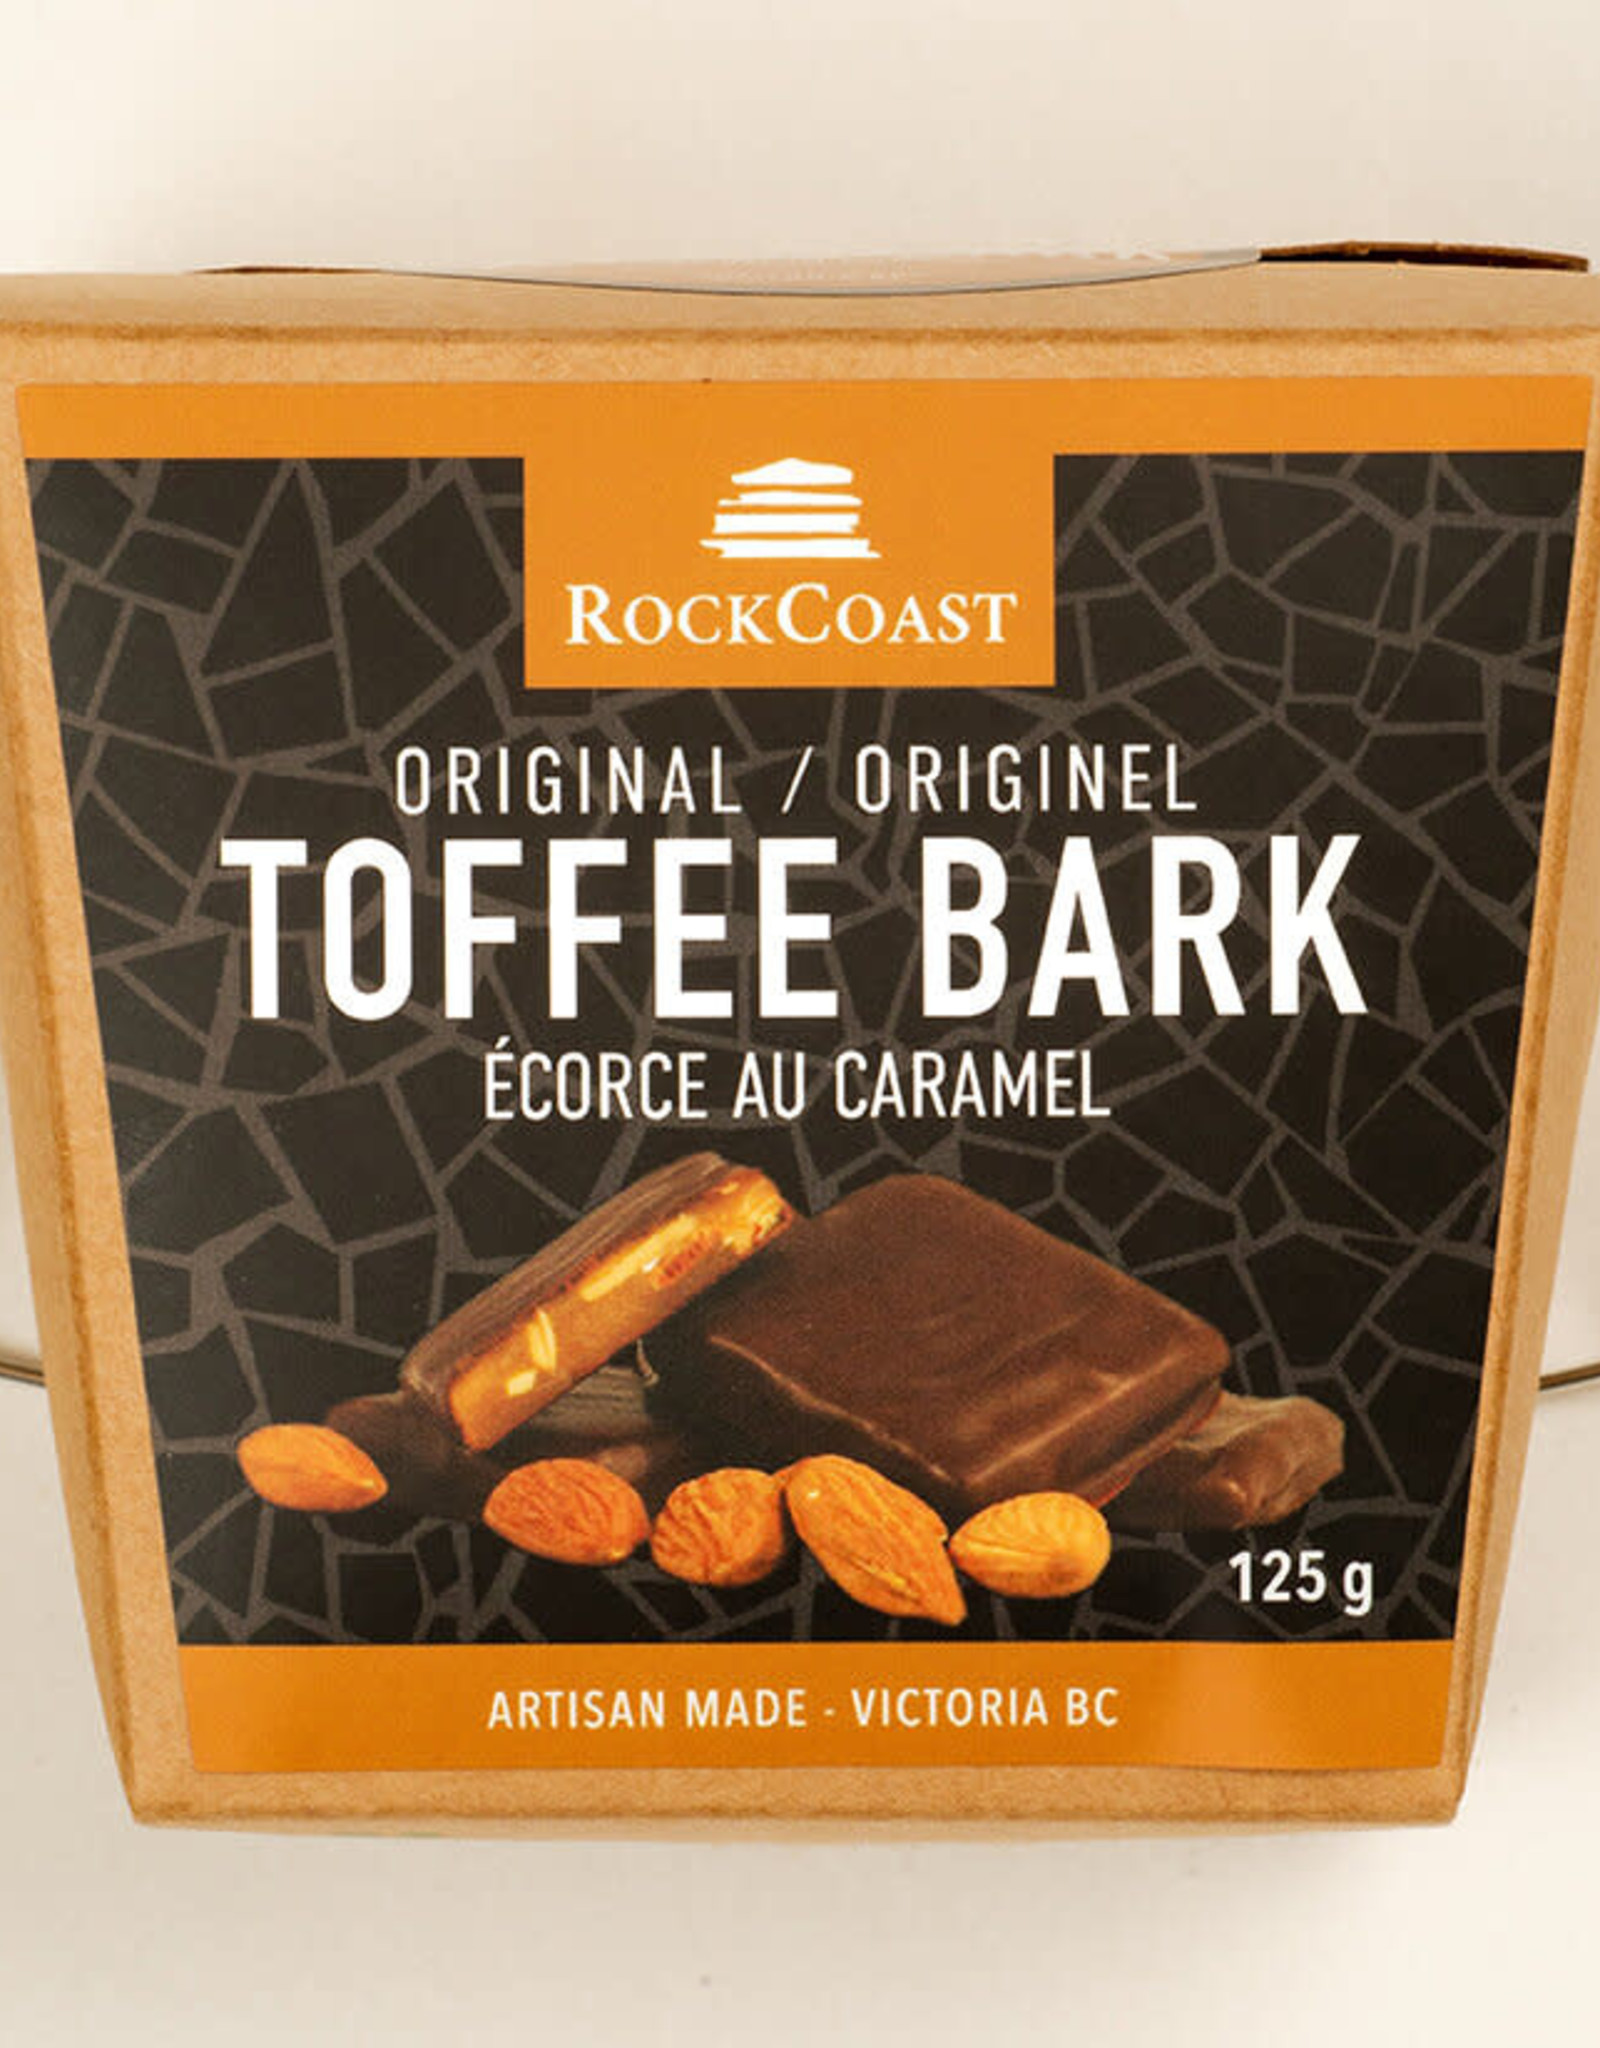 RockCoast Rock Coast Toffee bark - Original 125g box